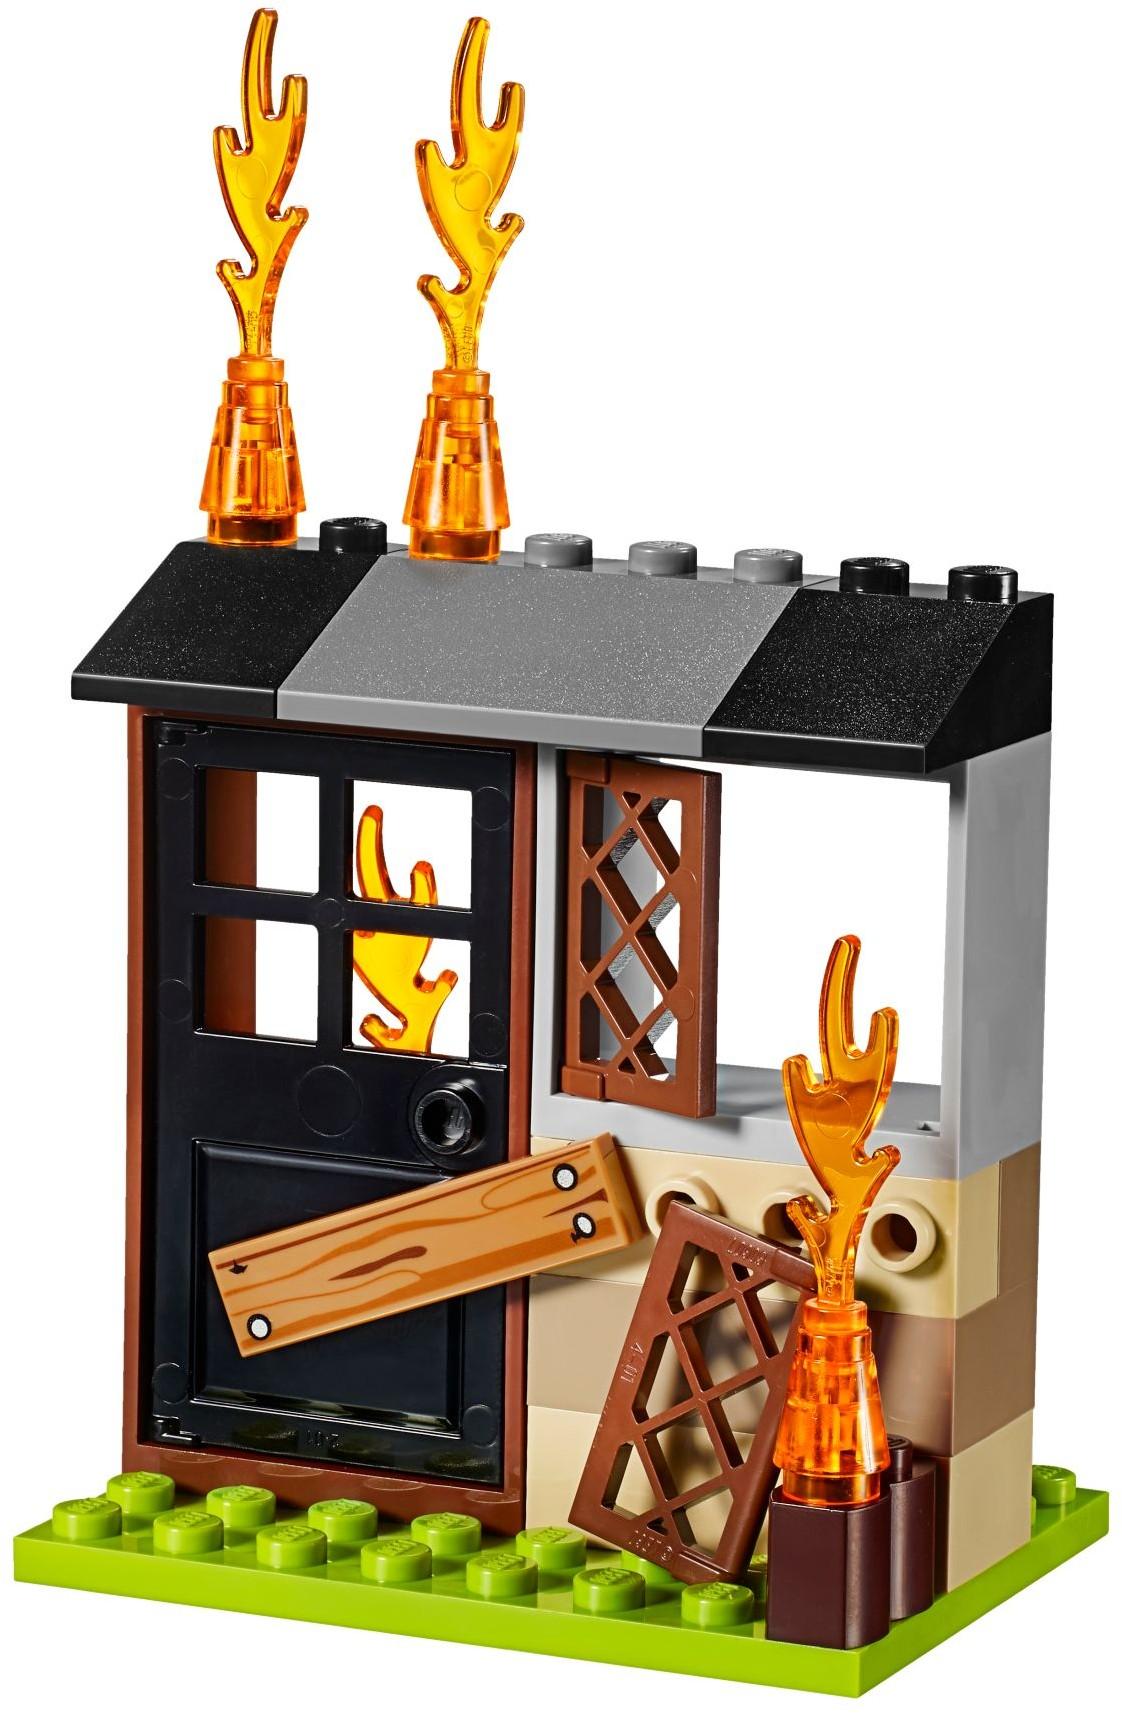 Mua đồ chơi LEGO 10740 - LEGO Juniors 10740 - Cặp Xách Ráp Xe Cứu Hỏa (LEGO Juniors Fire Patrol Suitcase 10740)